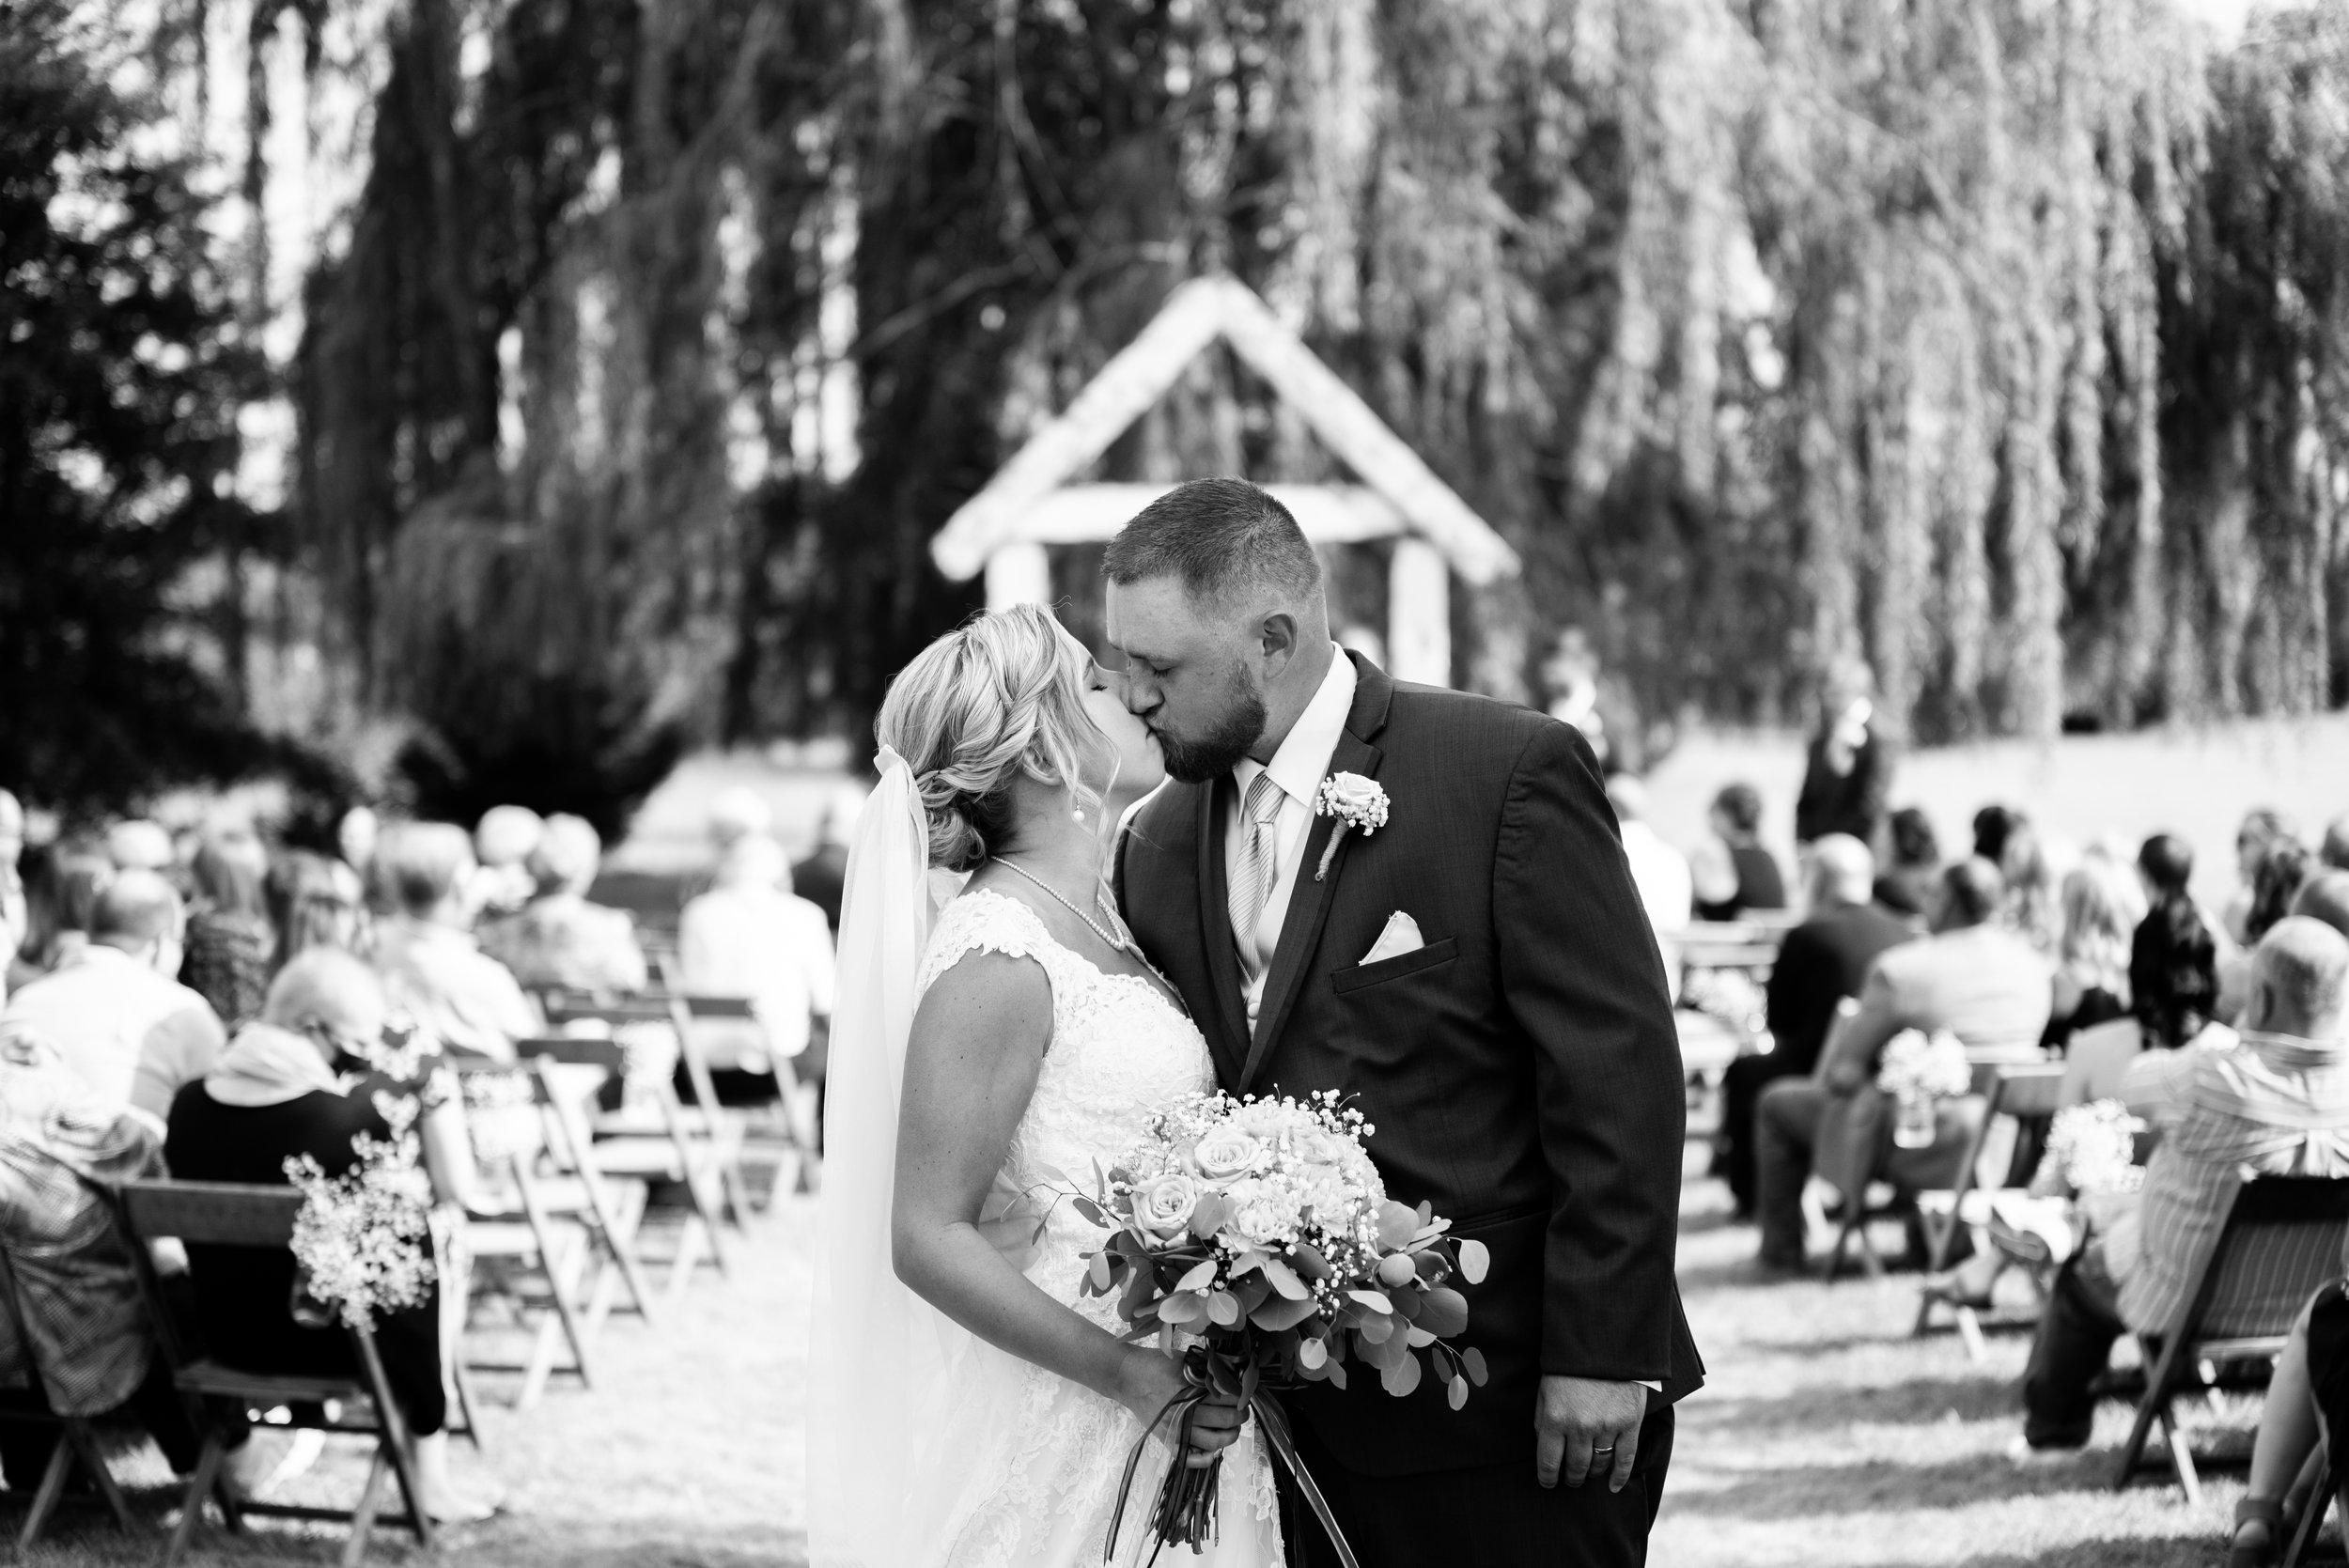 wedding (1 of 1)-94.jpg